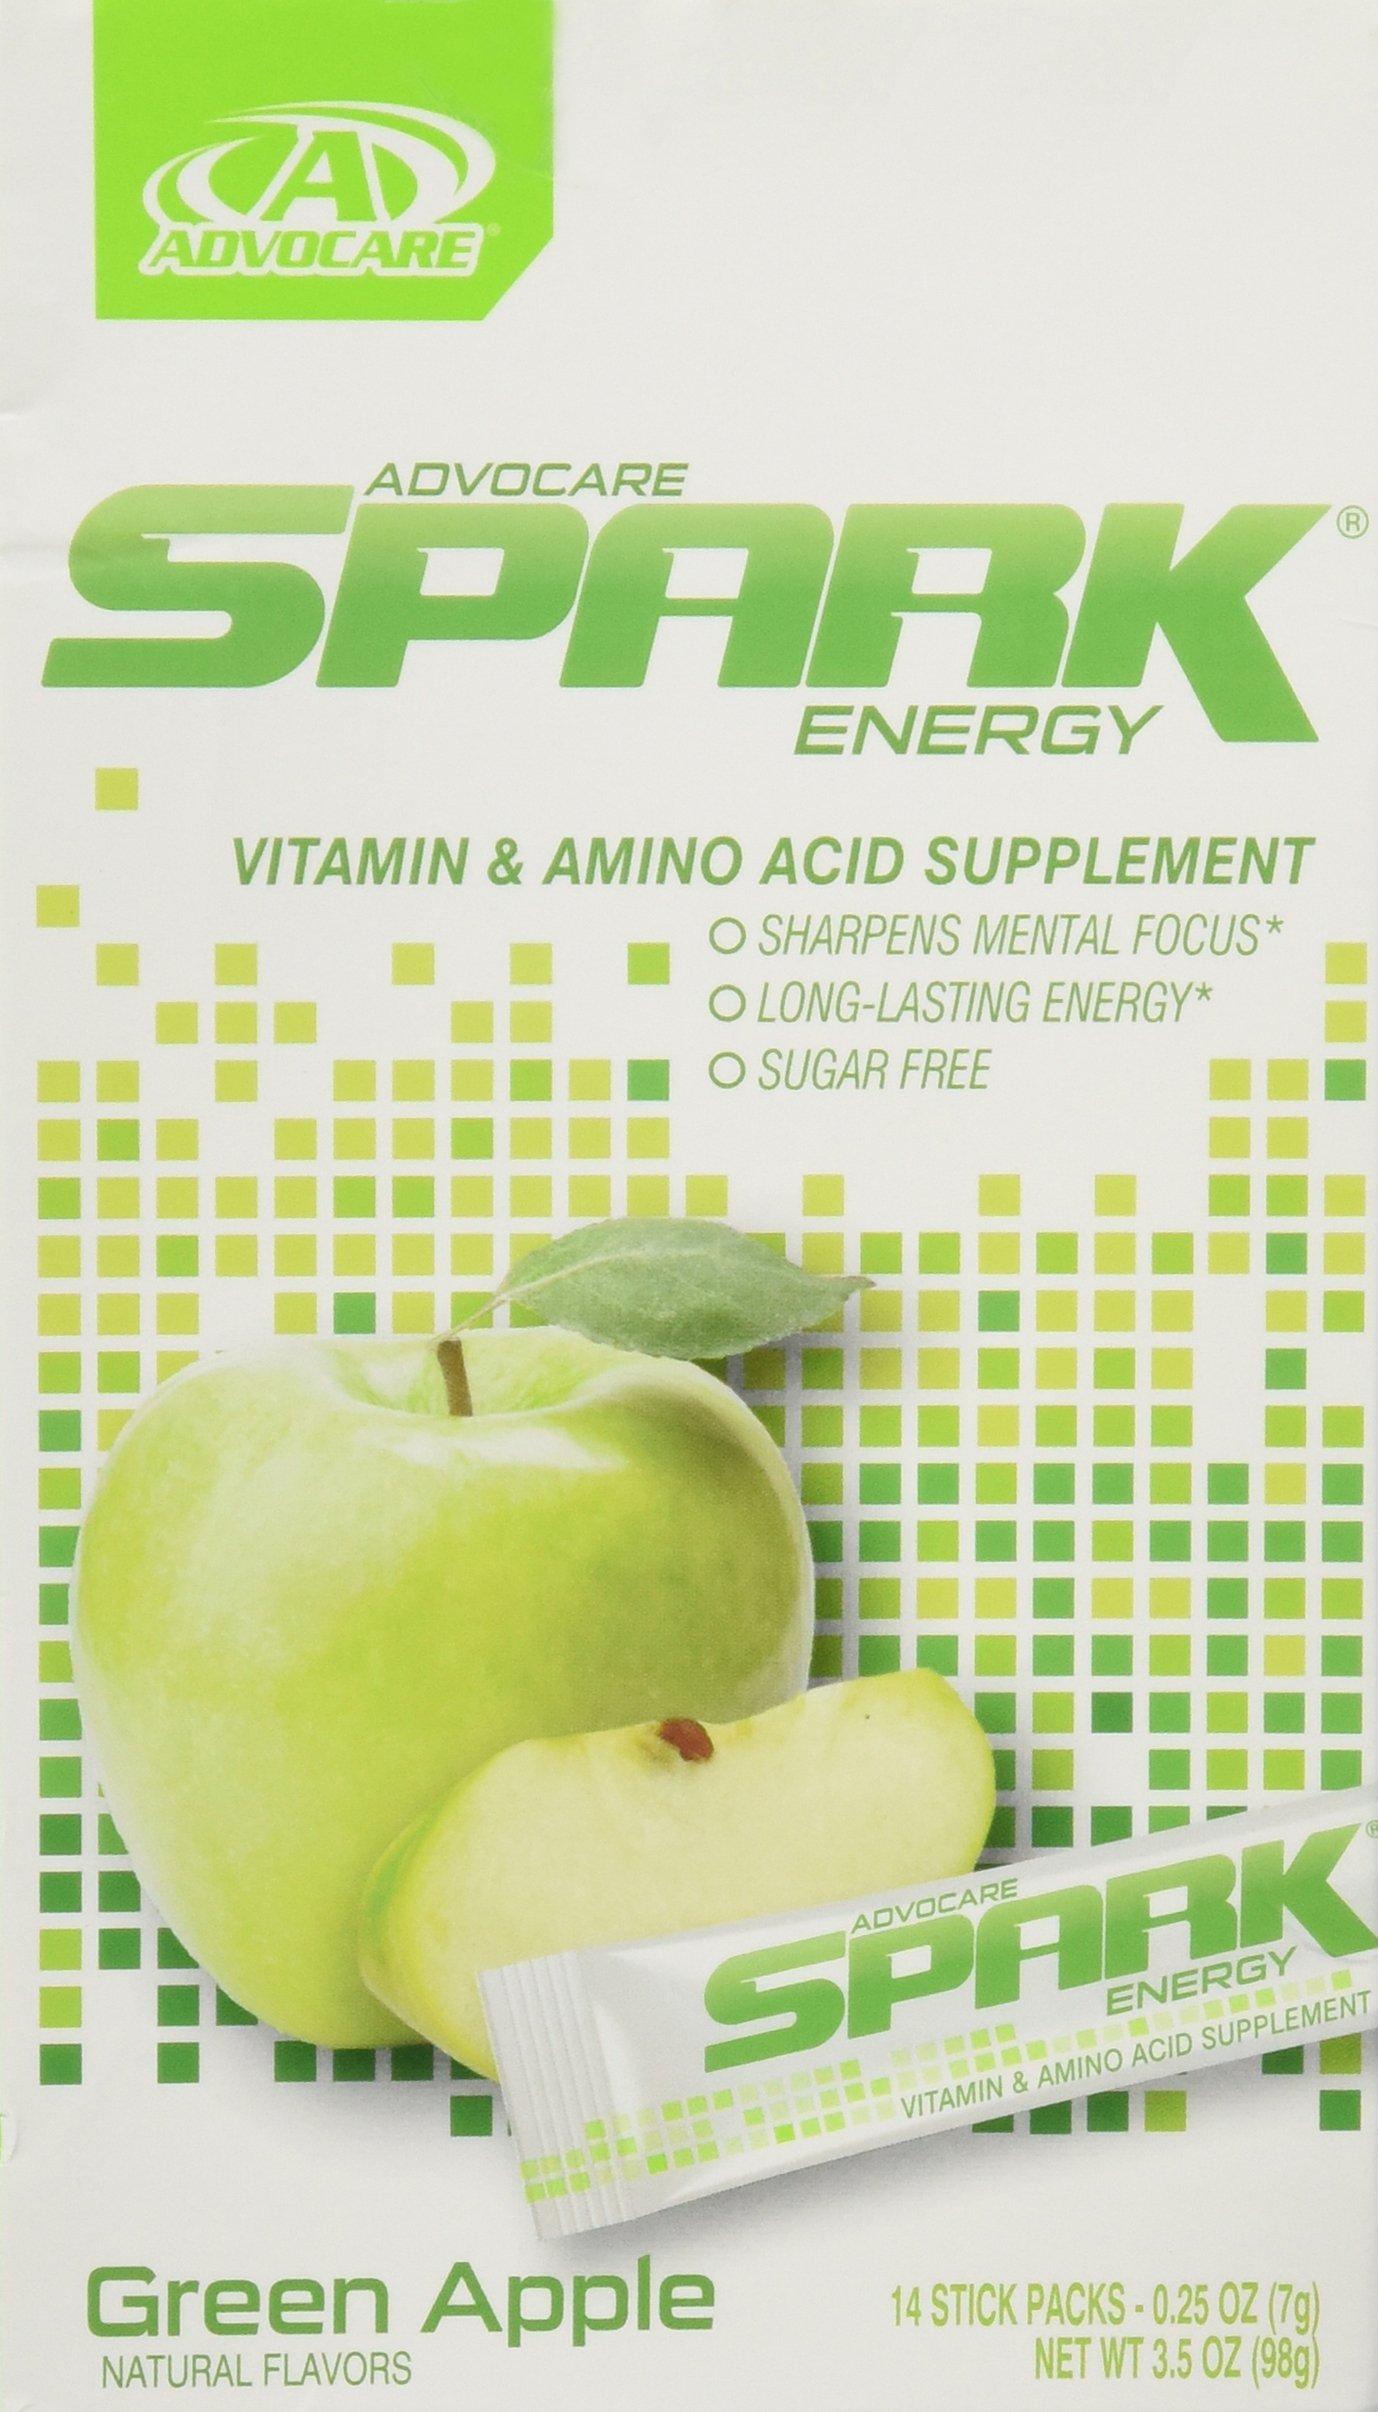 AdvoCare Spark Energy: Green Apple On the Go - 14 (0.25 oz) sticks